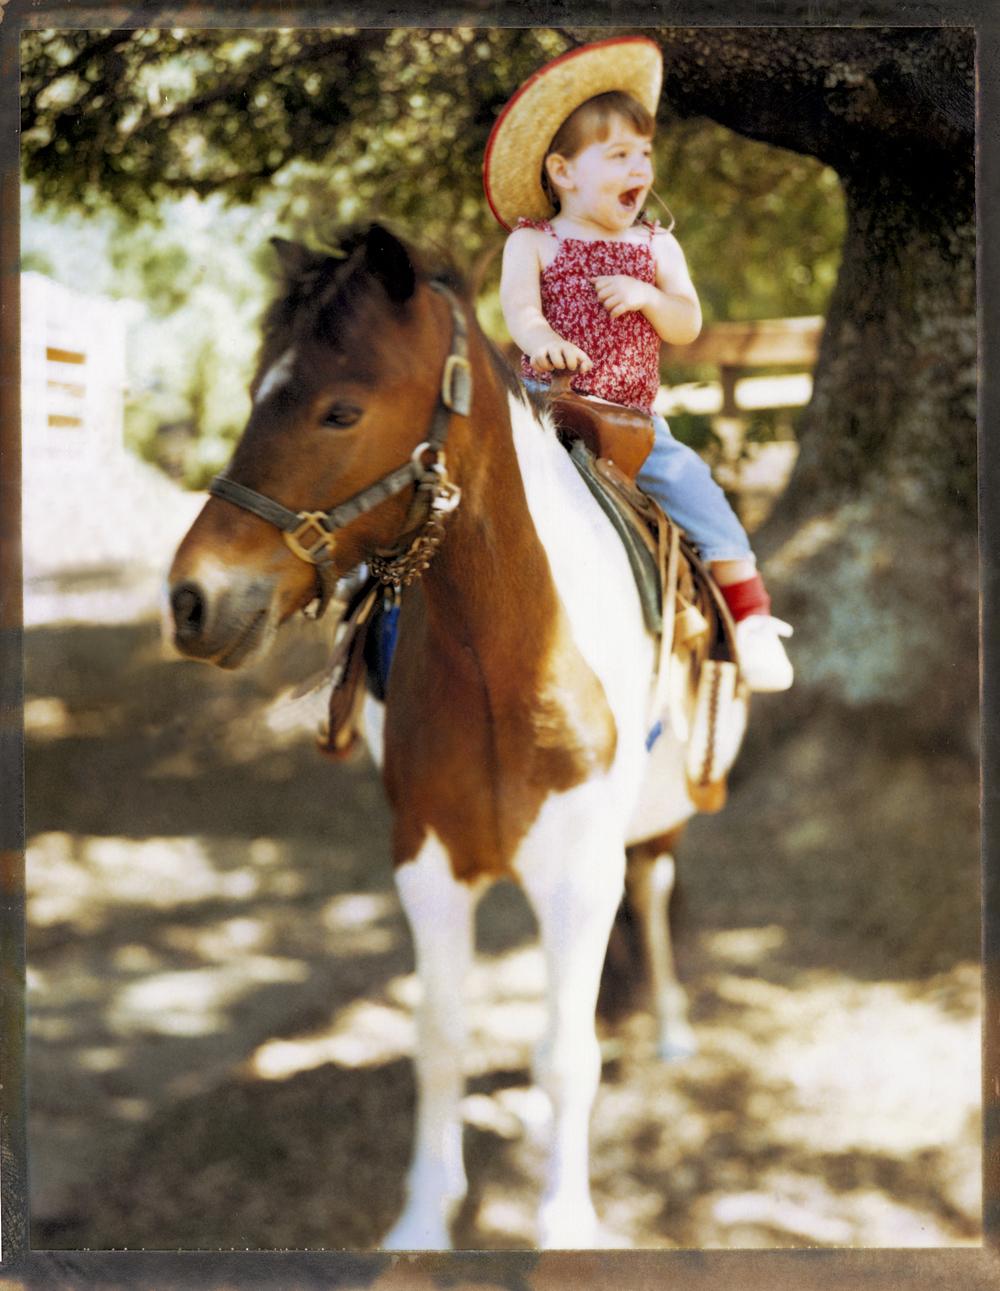 maddy on horse_Crop.jpg